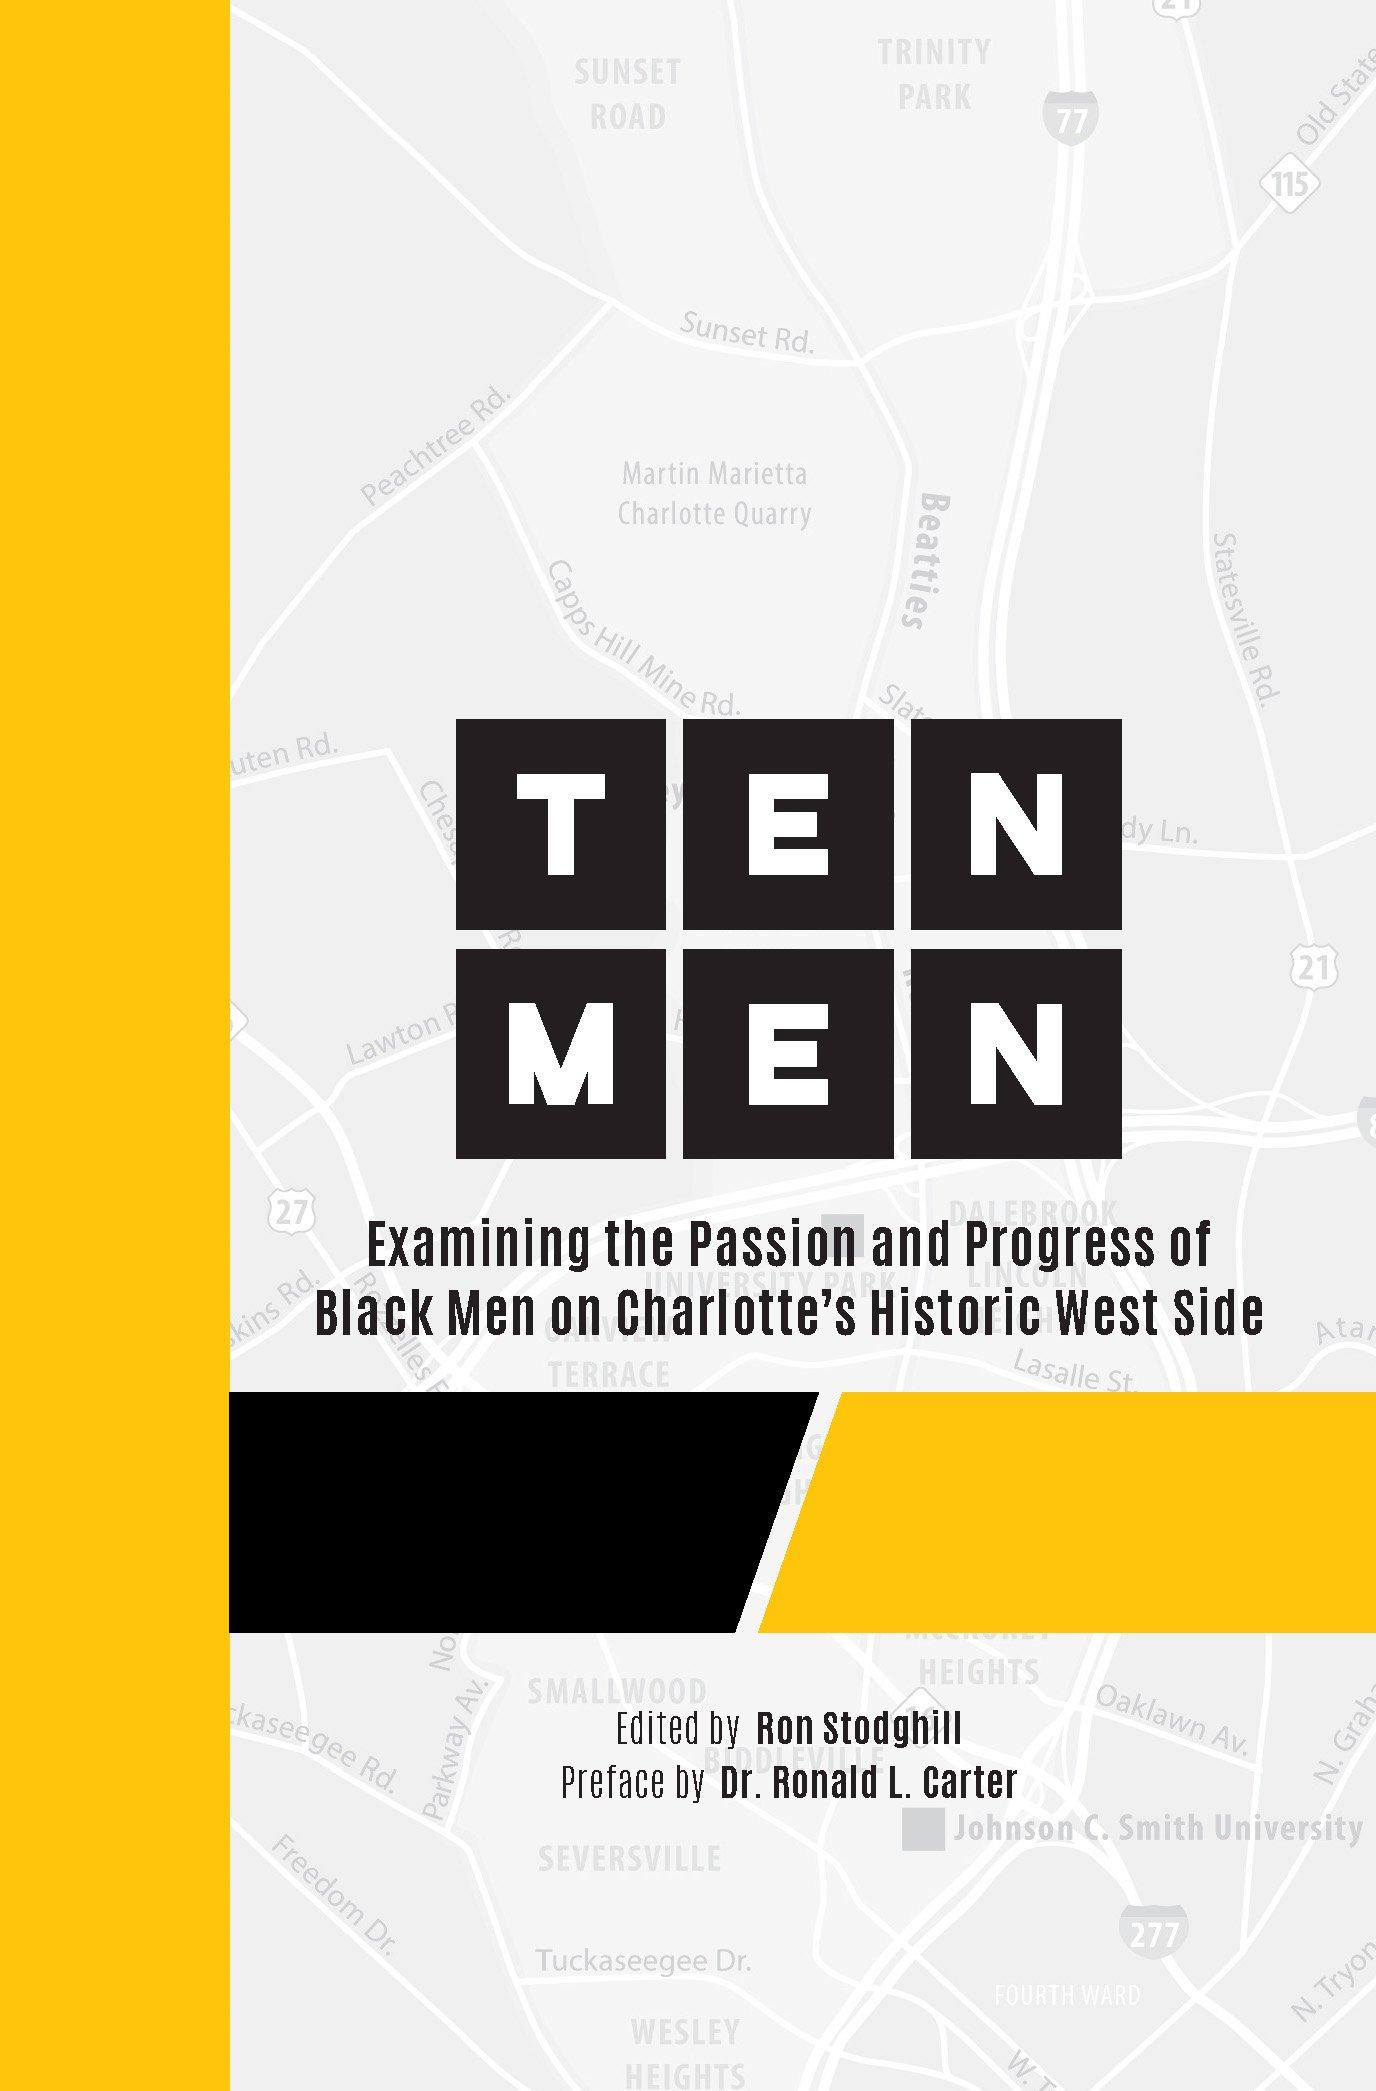 Ten Men: Examining the Passion and Progress of Black Men on ...